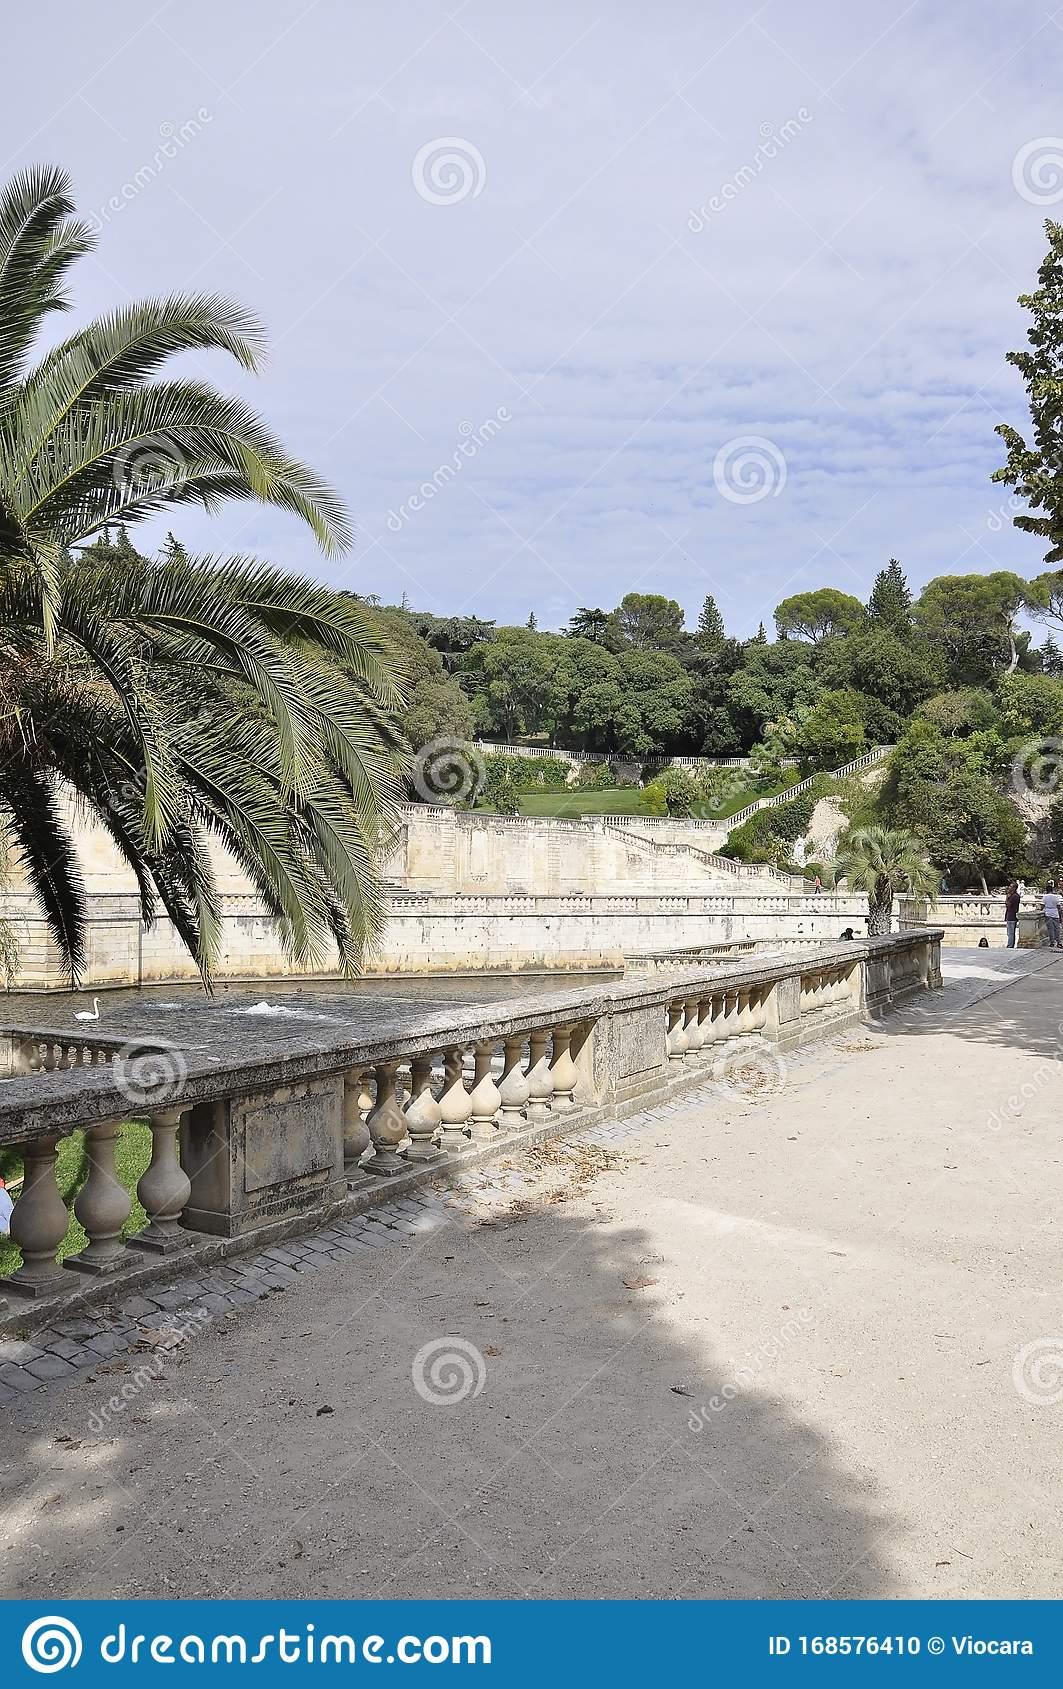 landscape source water canal jardin de la fontaine garden nimes south france th september landscape